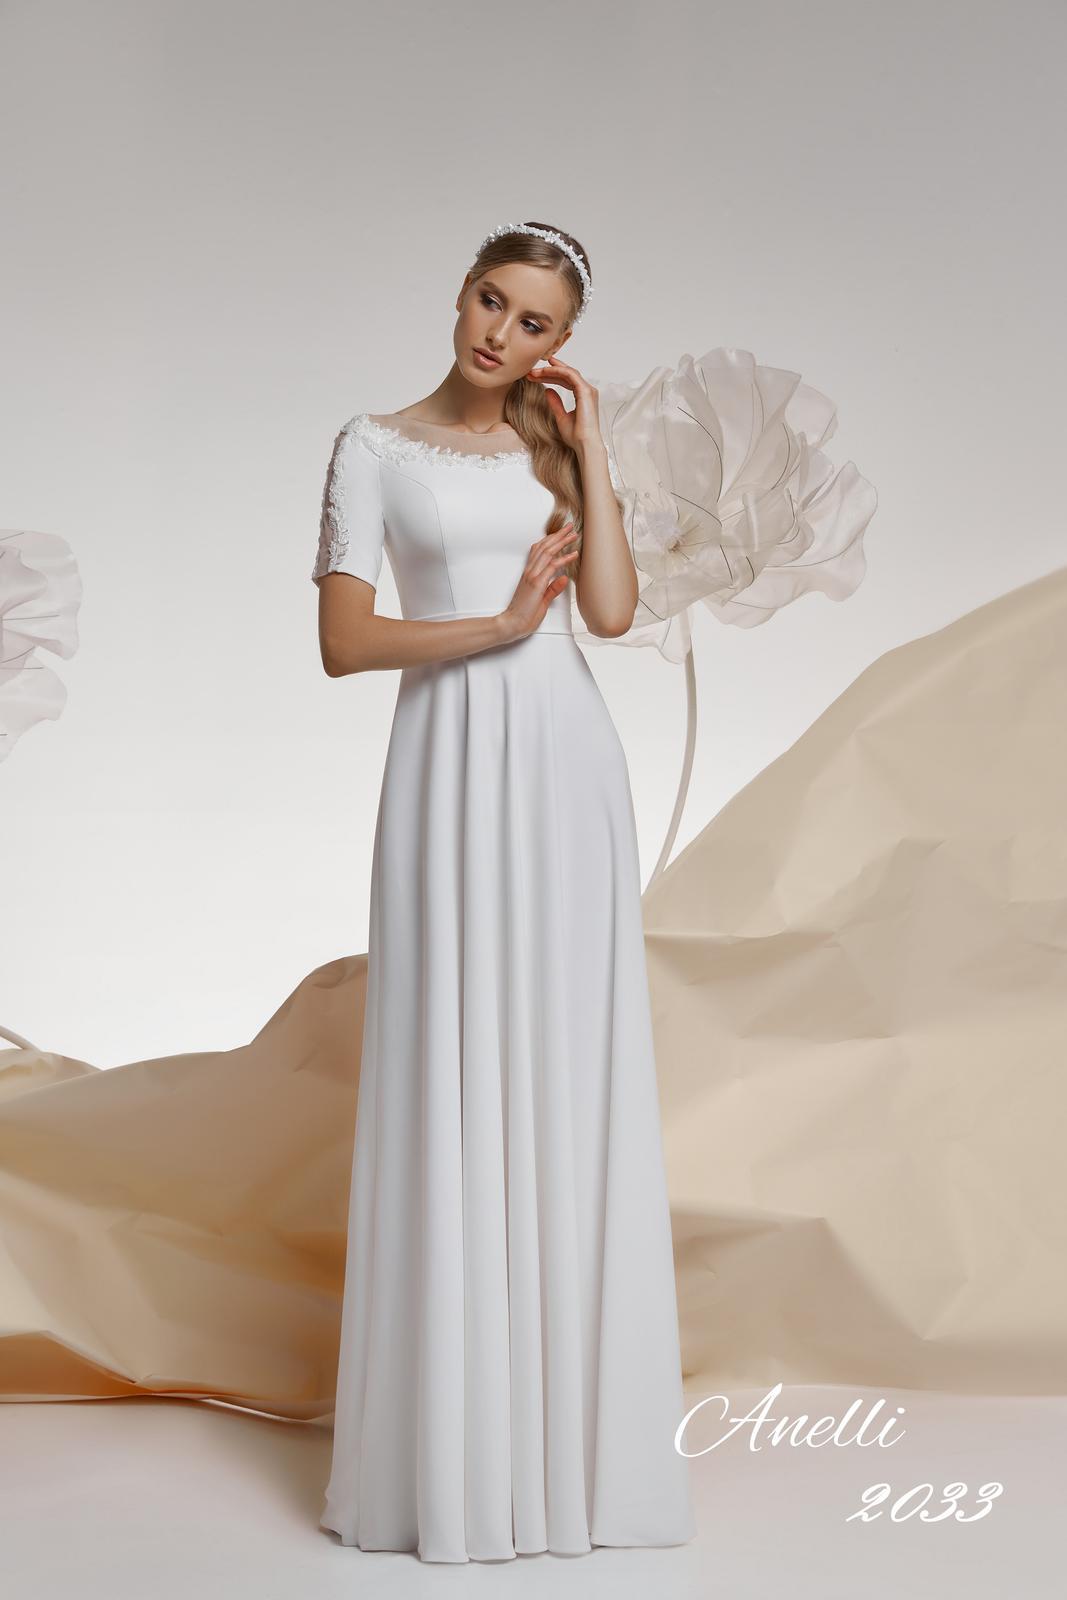 Svadobné šaty - Imagine 2033 - Obrázok č. 1